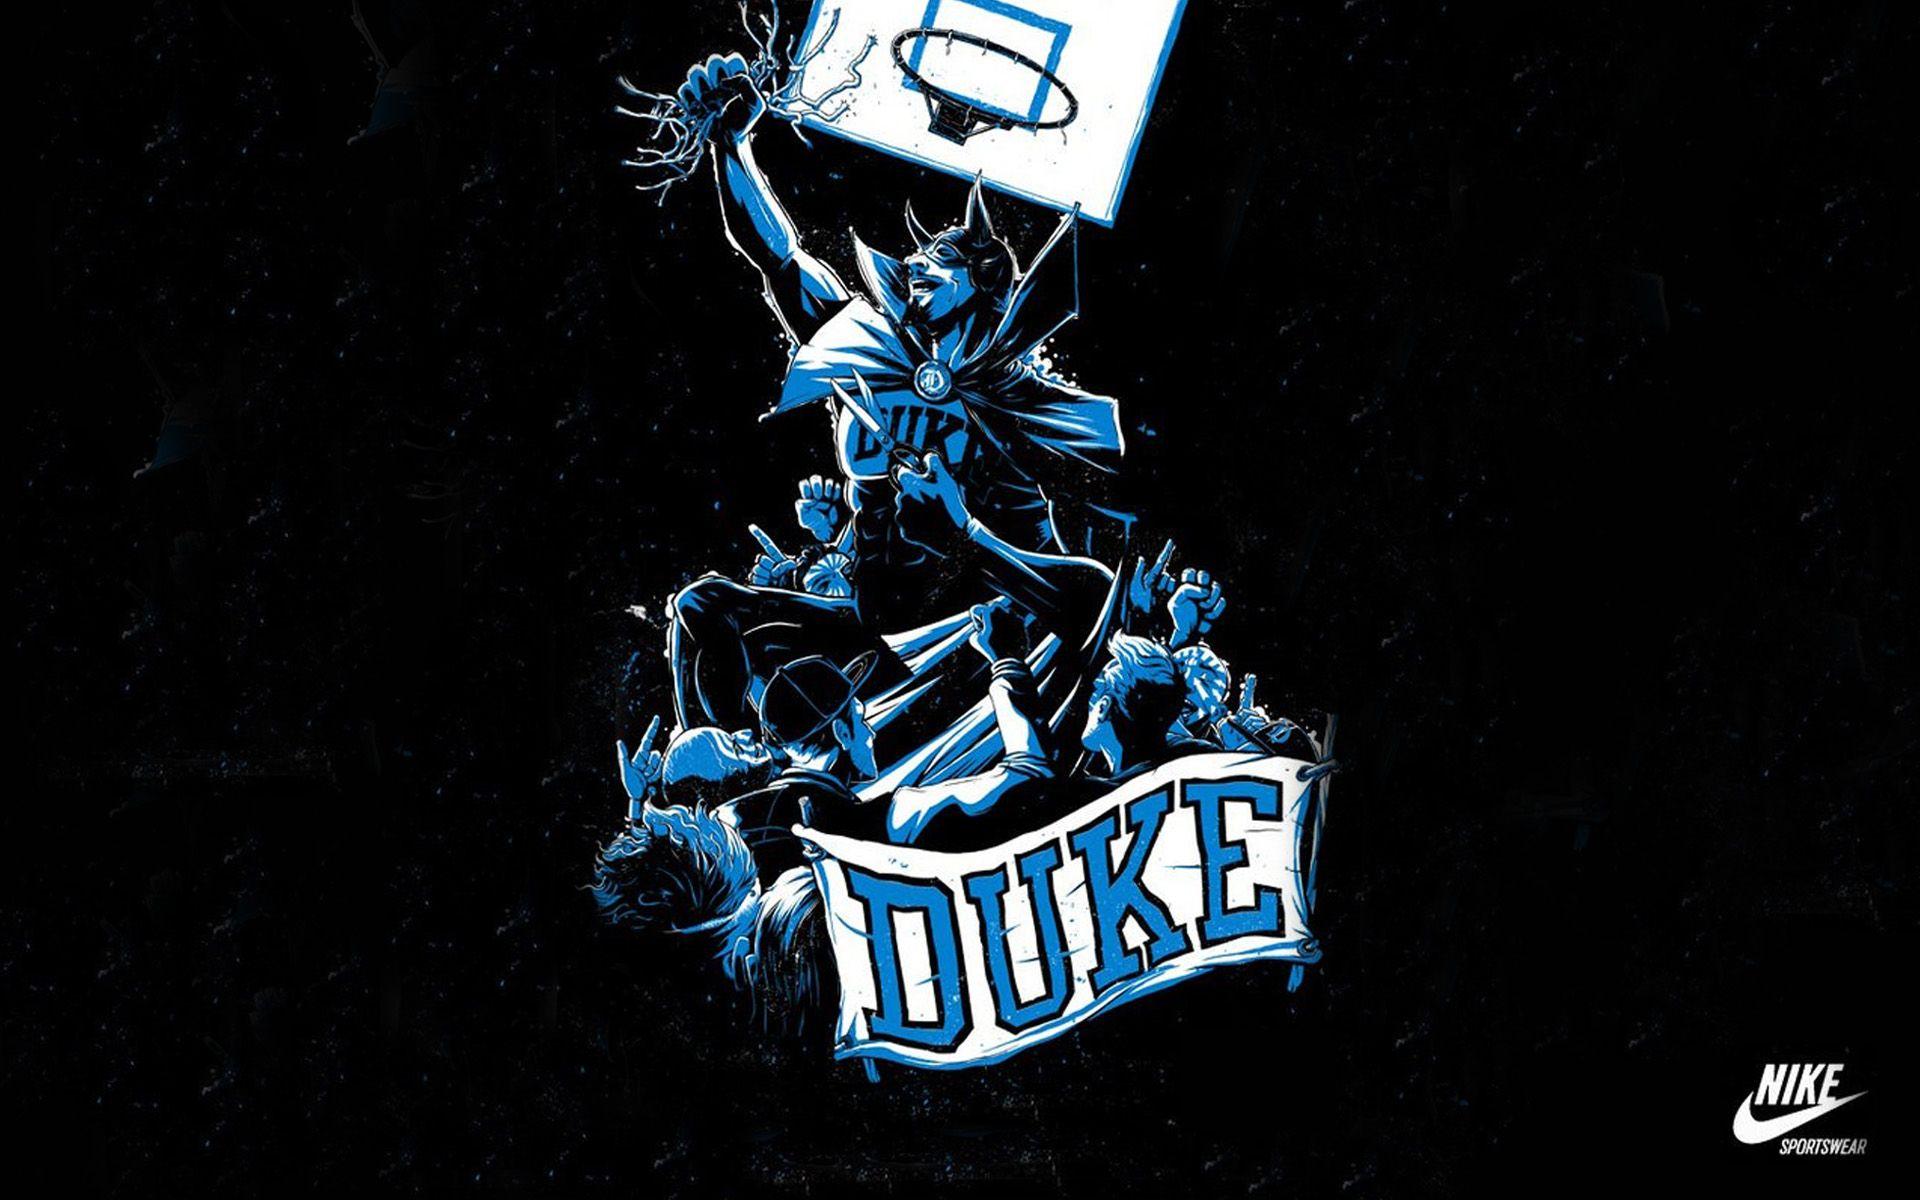 Duke Basketball Art Wallpaper - Free Download Wallpaper ...